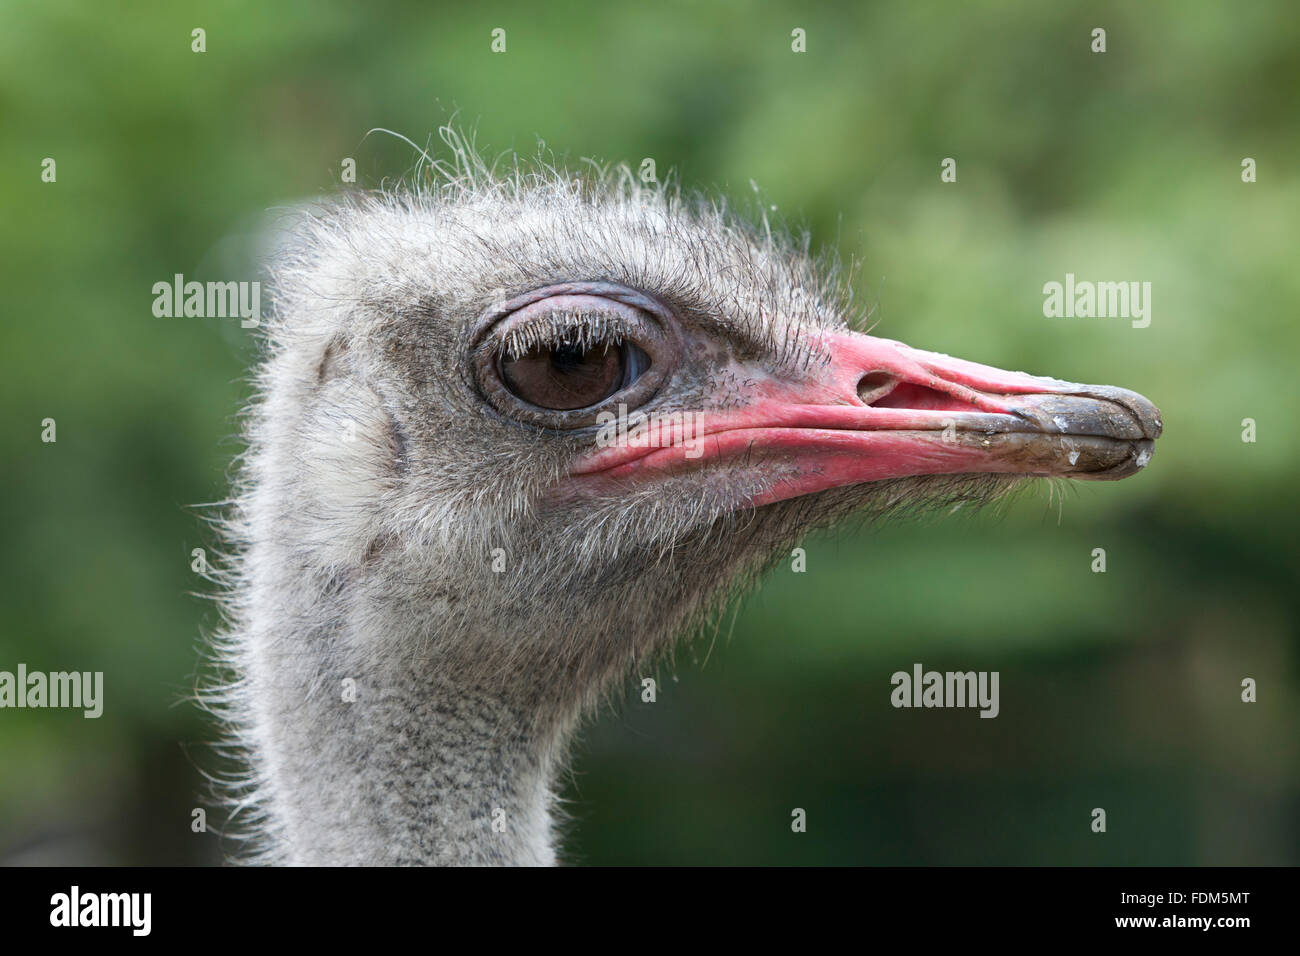 Cabeza de avestruz en profil cerrar Imagen De Stock